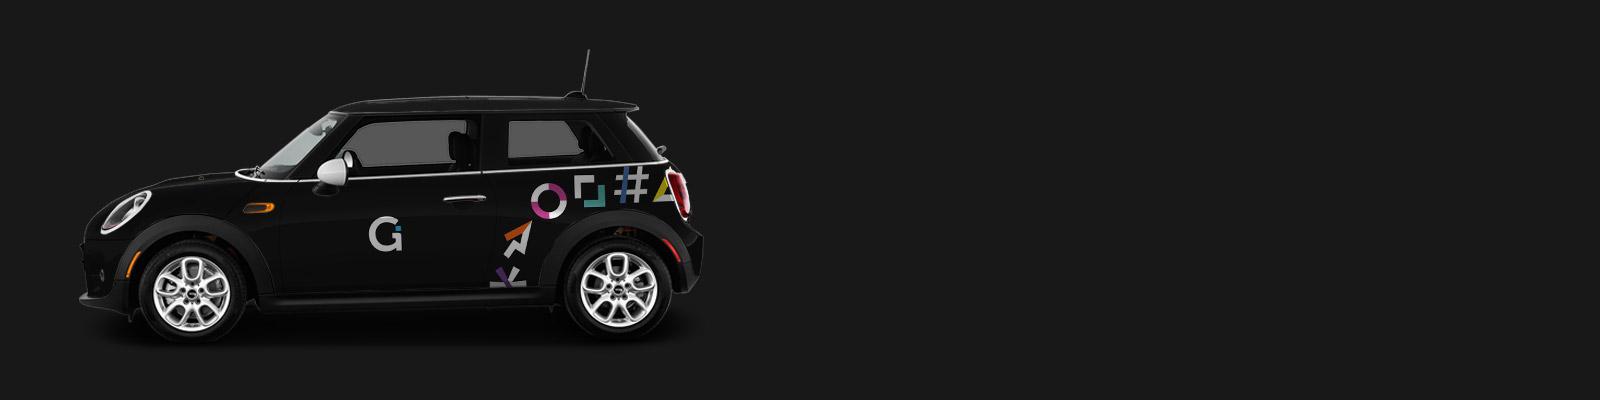 Impression & Signalétique - Covering véhicule